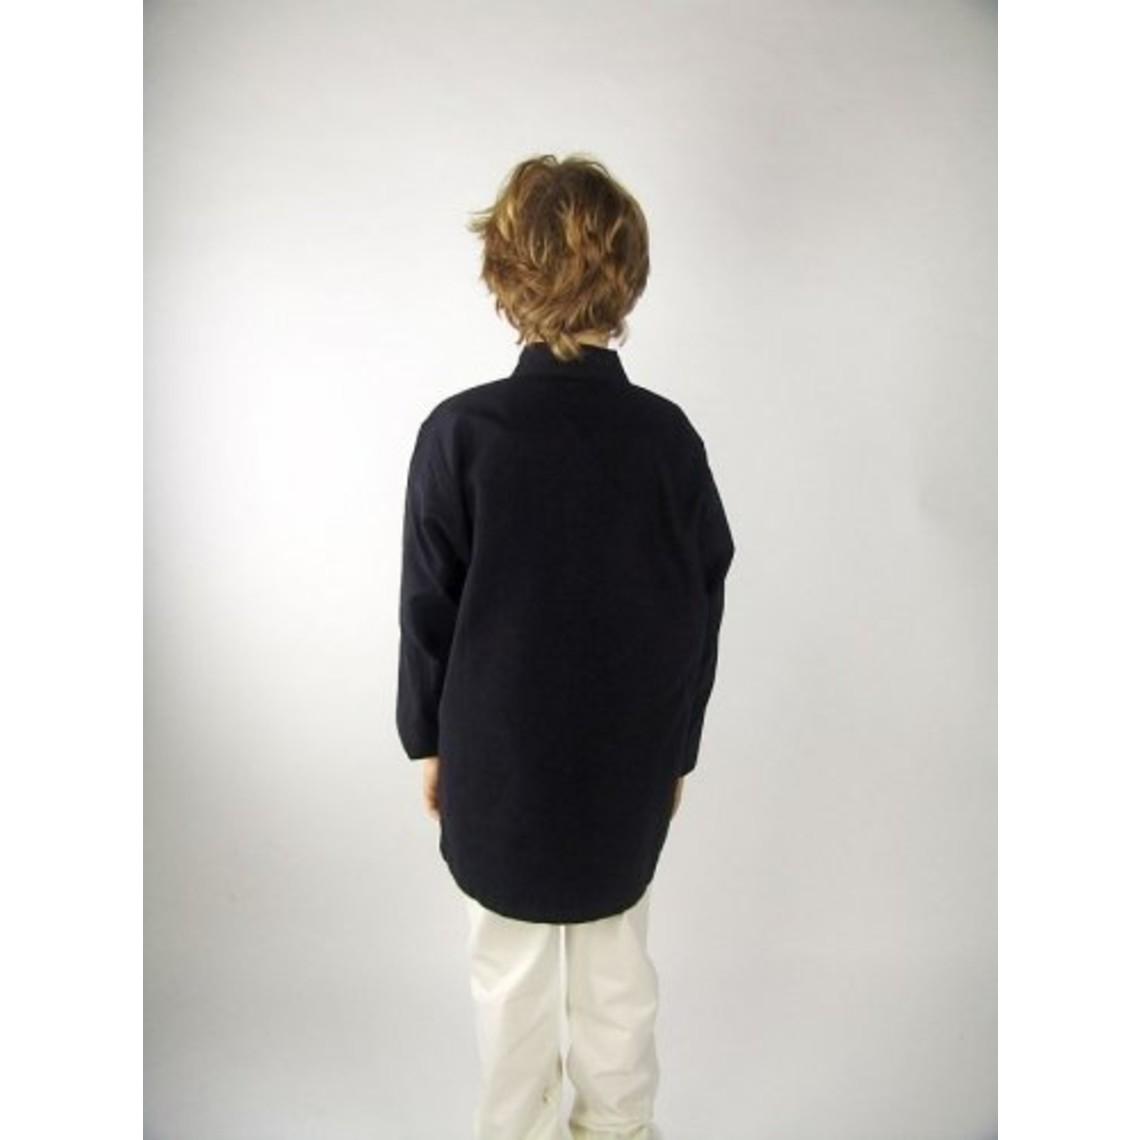 Leonardo Carbone Camisa tejida a mano para niños